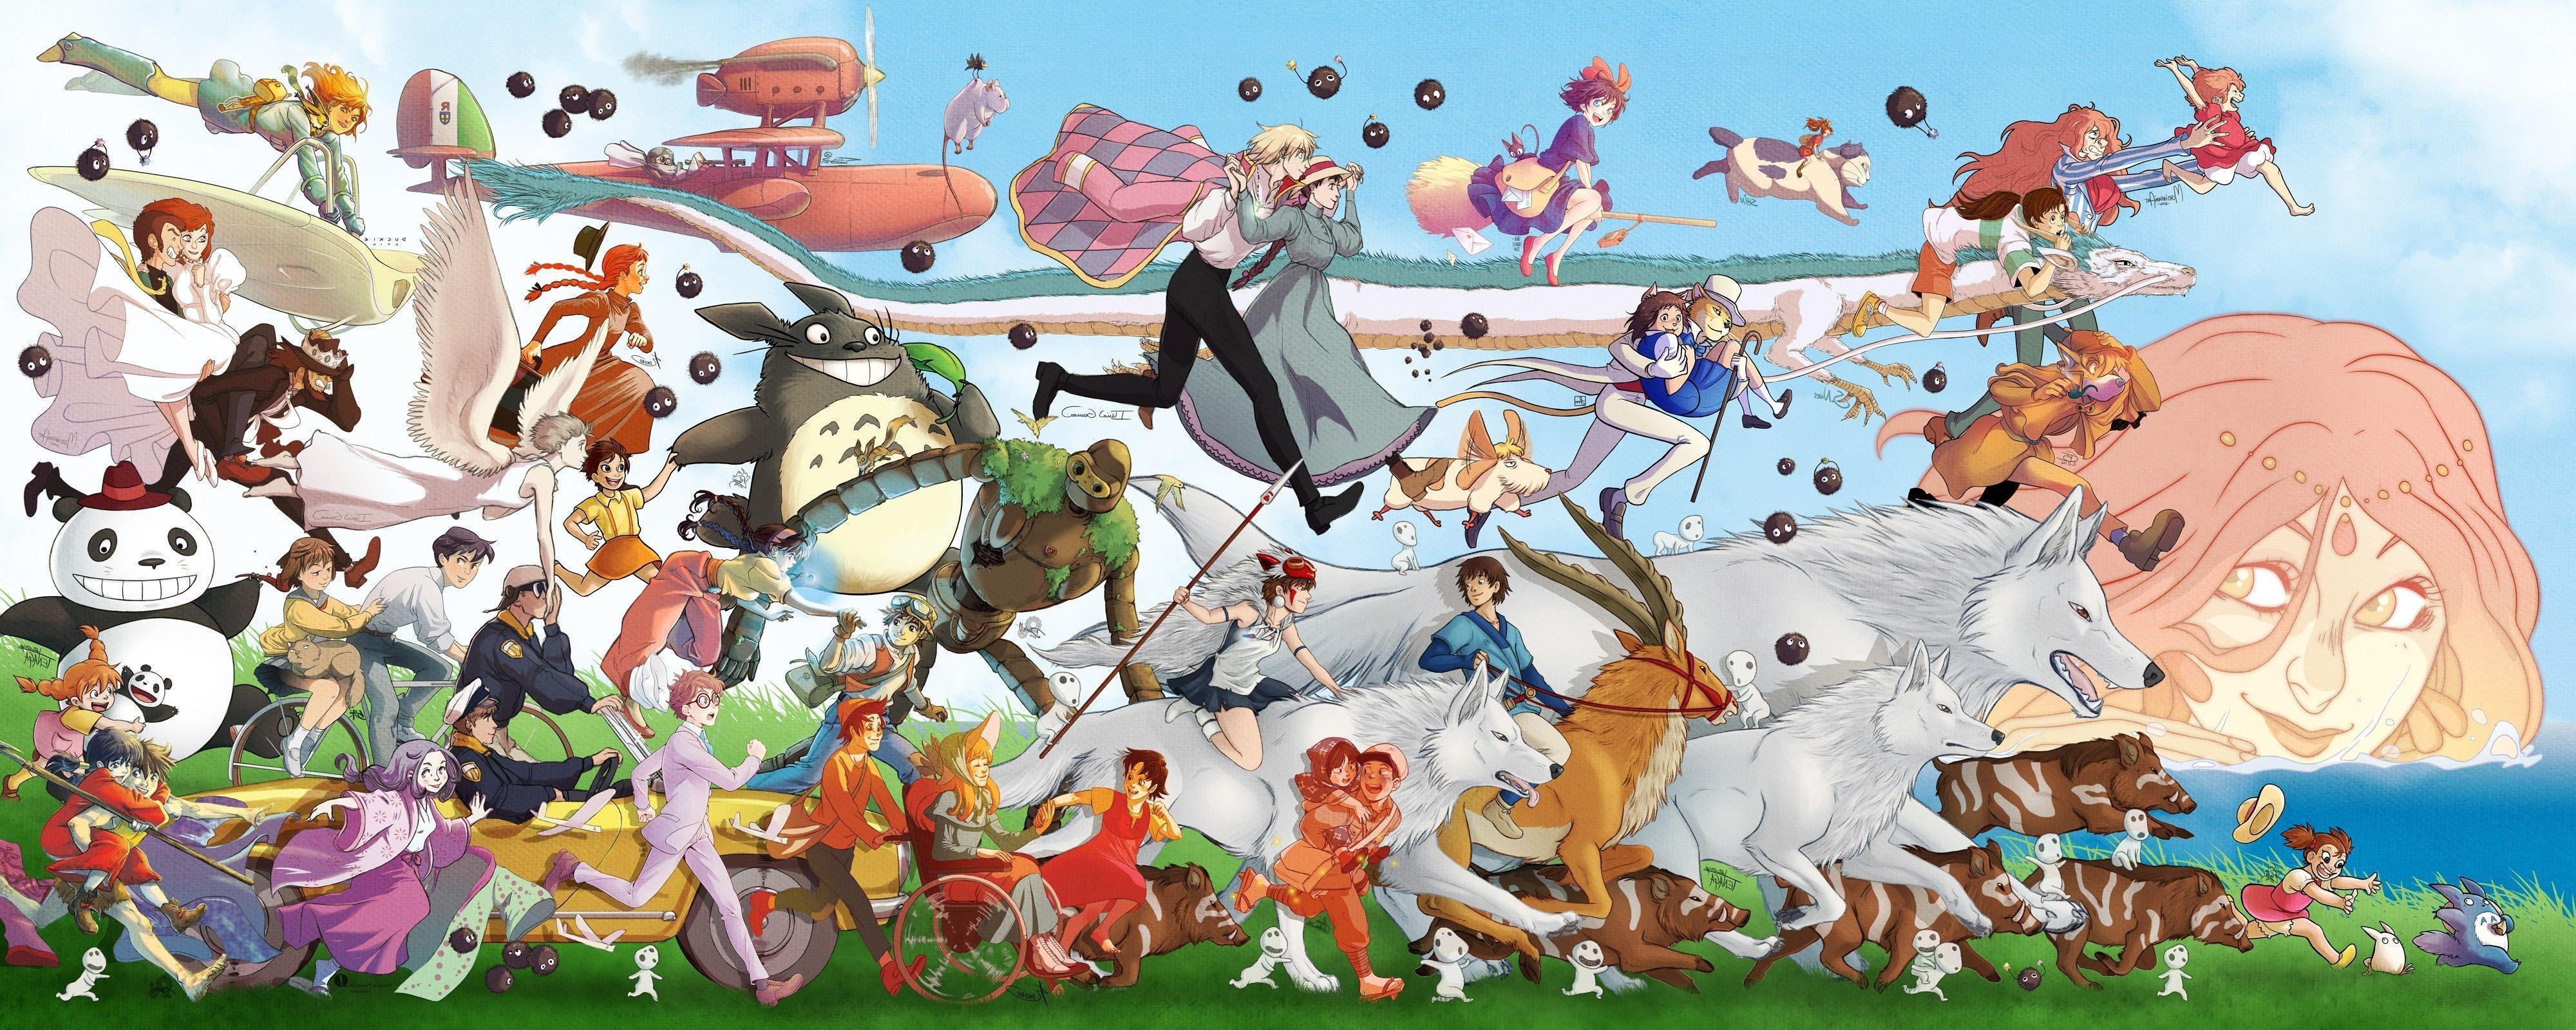 Studio Ghibli Characters Wallpapers Top Free Studio Ghibli Characters Backgrounds Wallpaperaccess